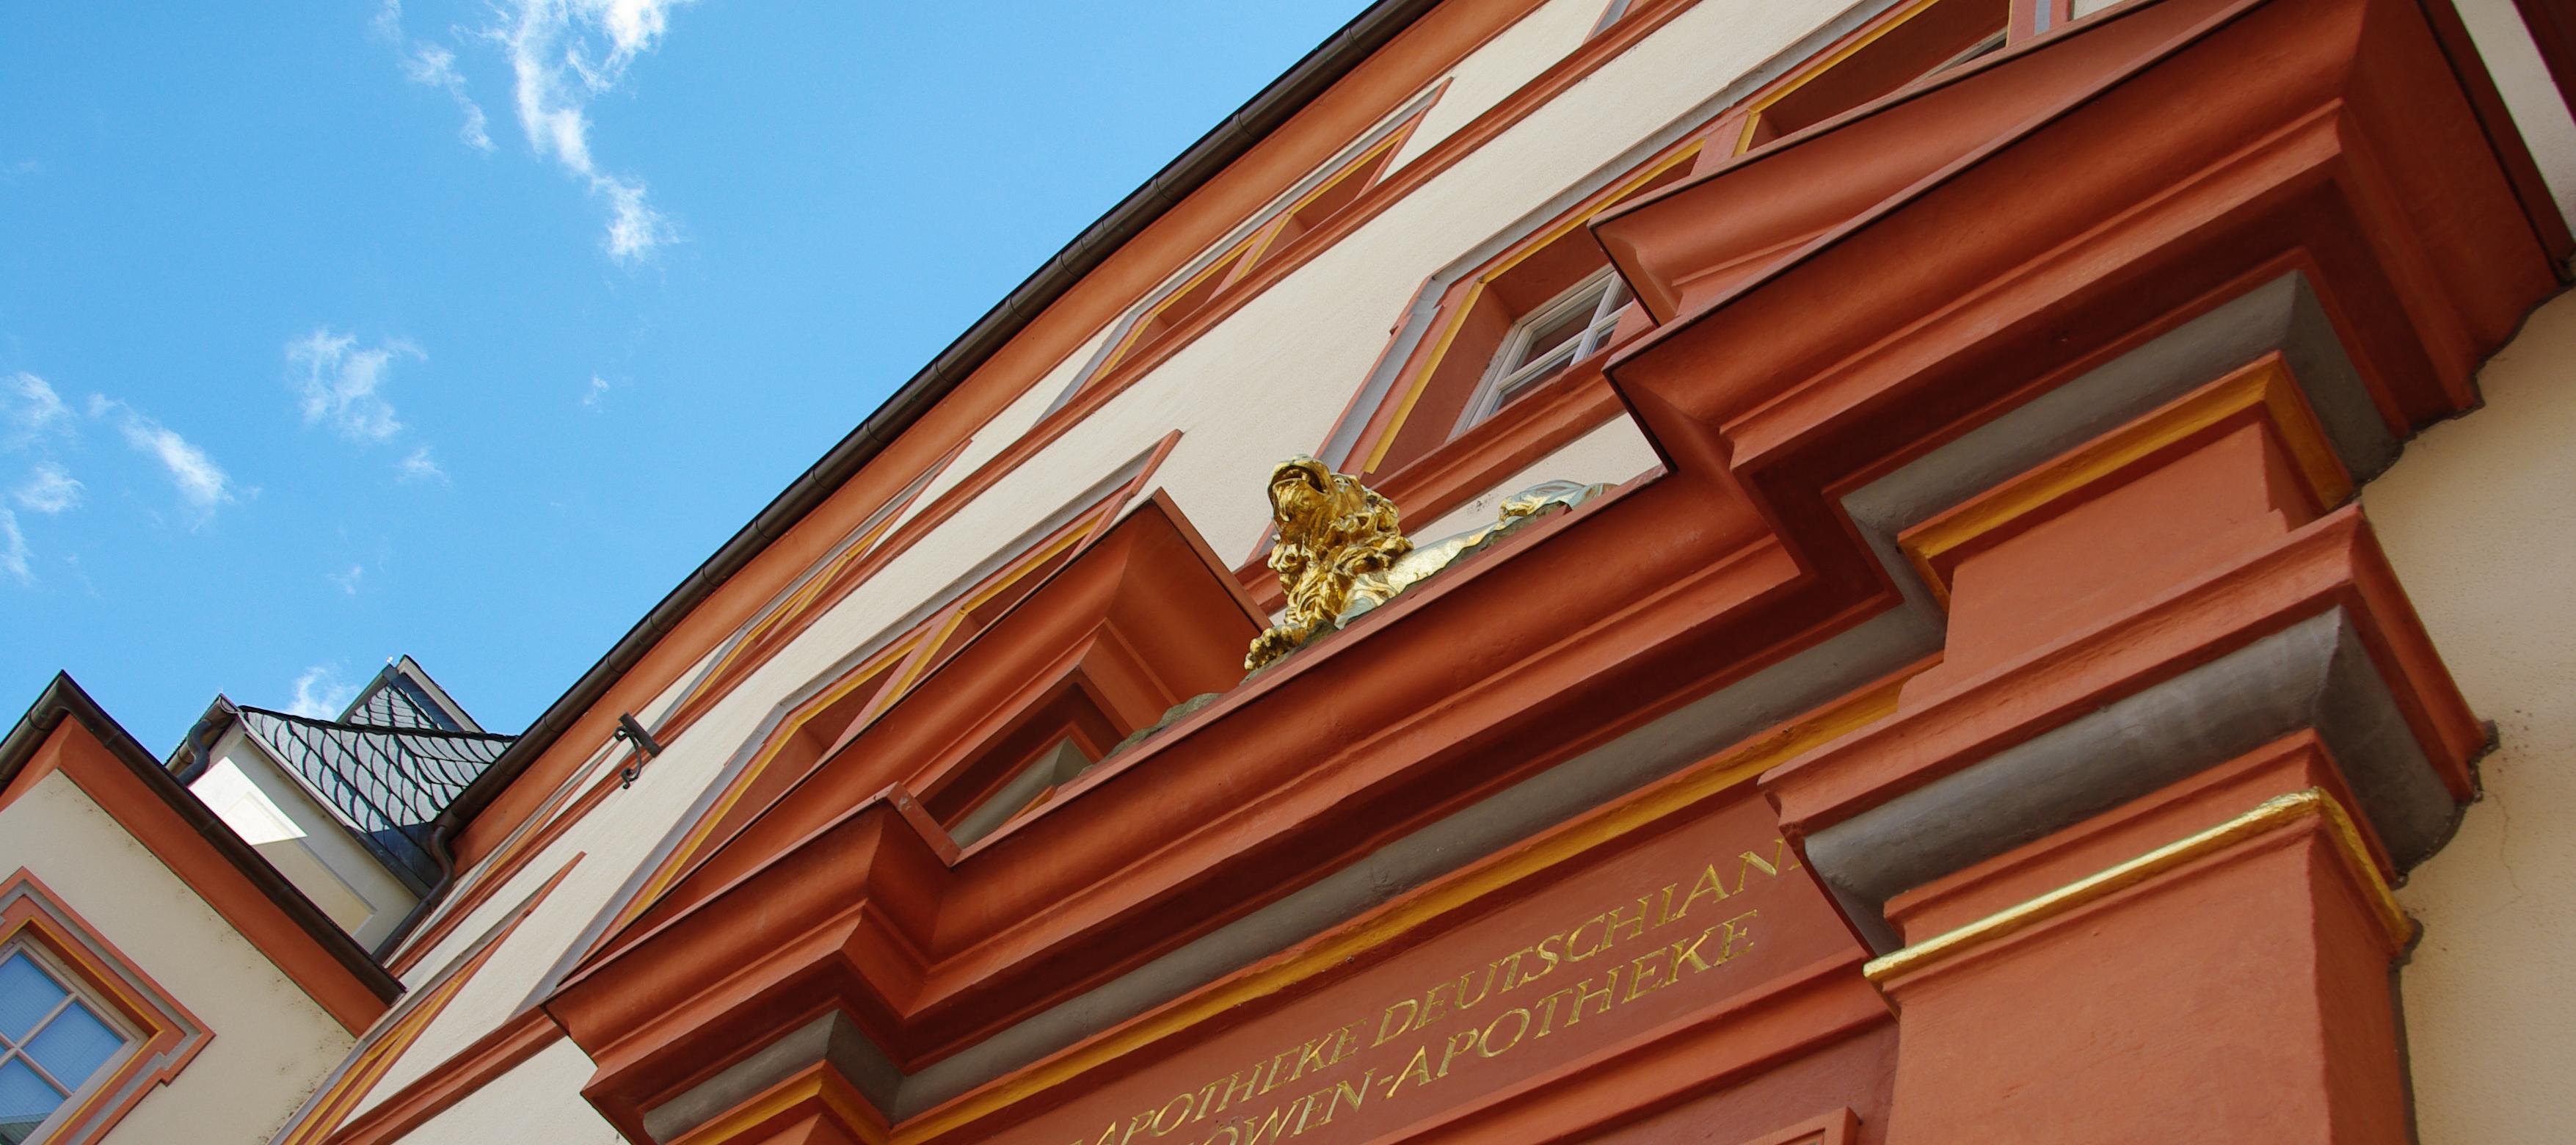 Löwenapotheke Hauptmarkt Fassade